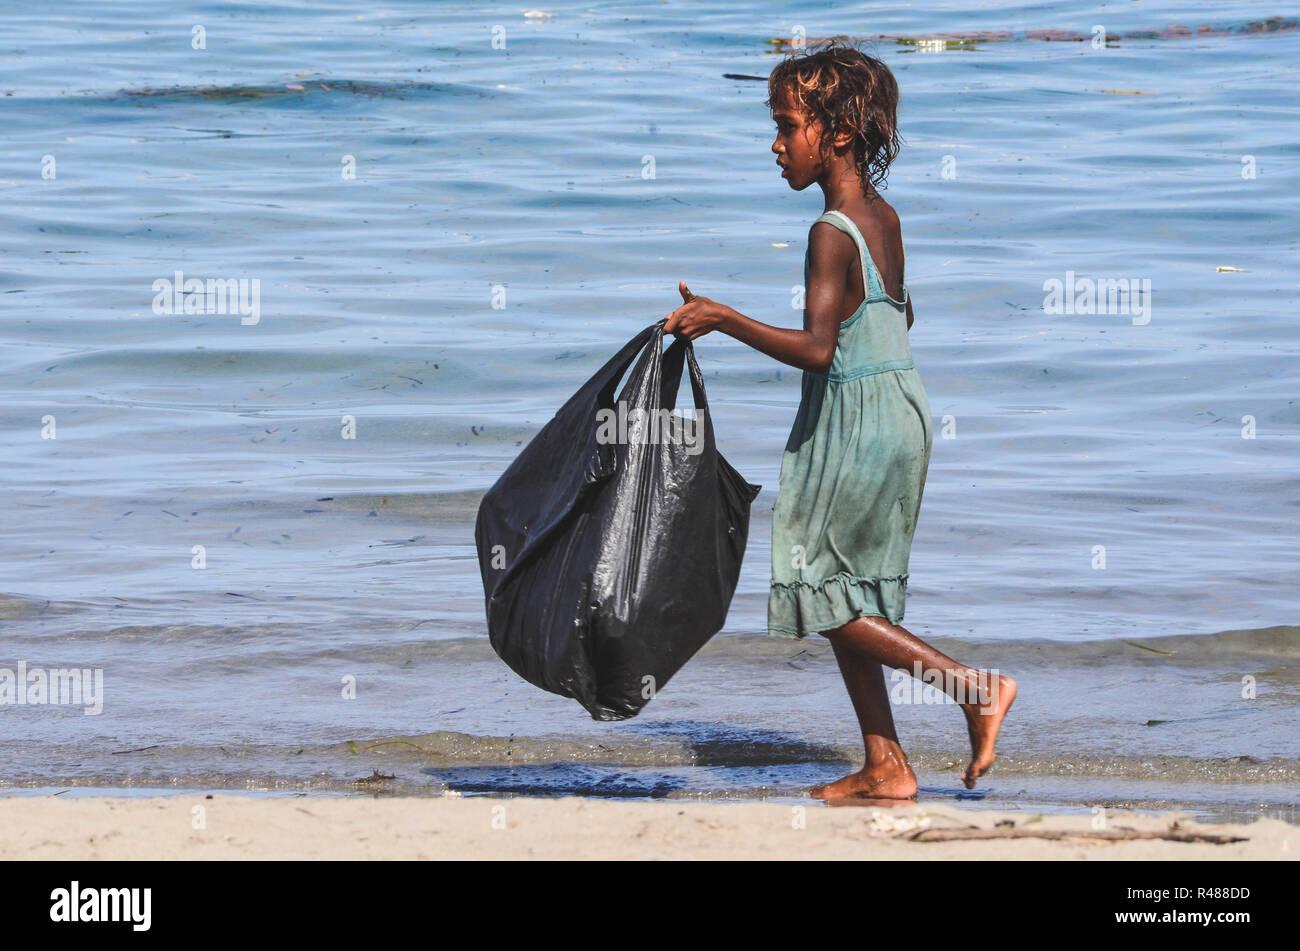 Atauro Island and Dili, East Timor (Timor Leste) Stock Photo